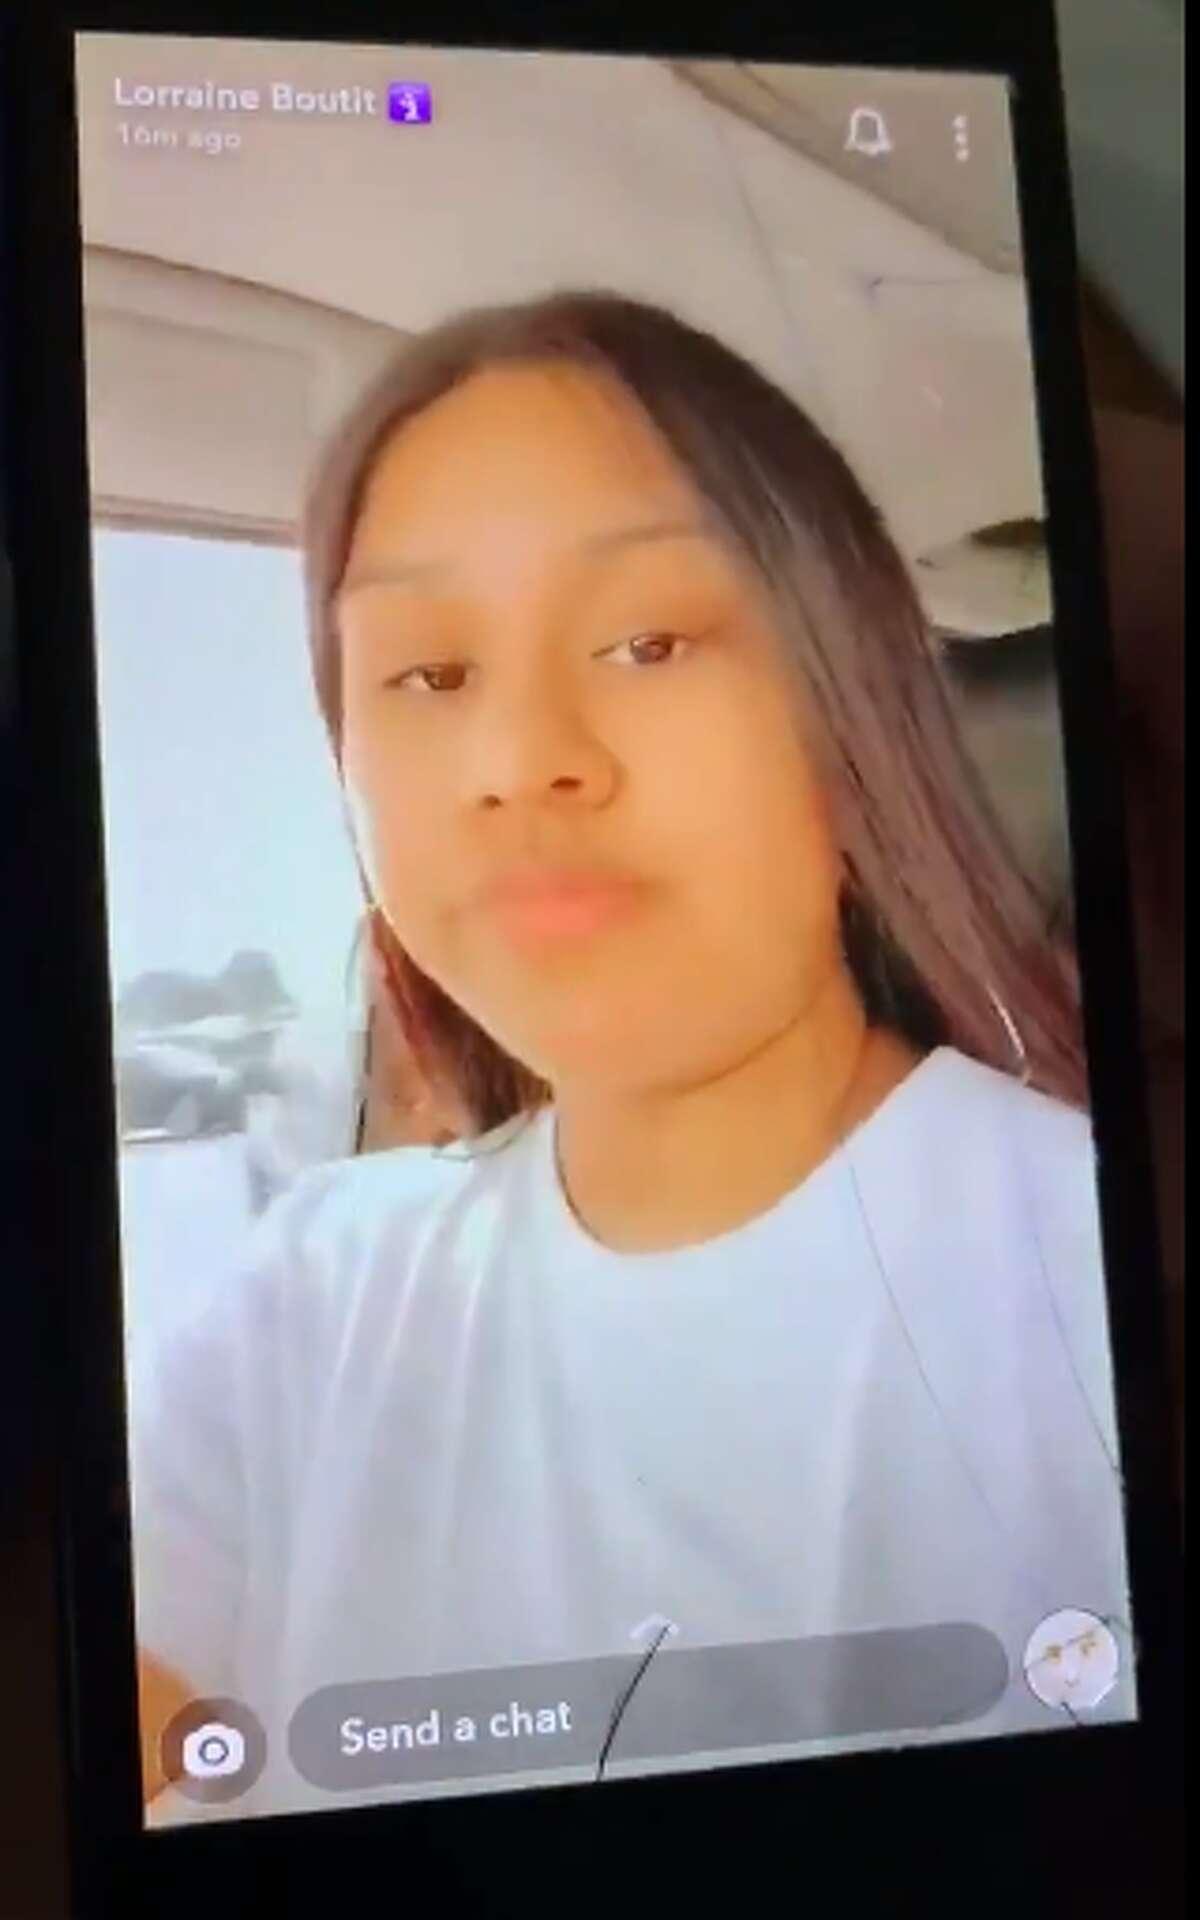 The Carrollton Police Department said Lorraine Maradiaga, 18, was